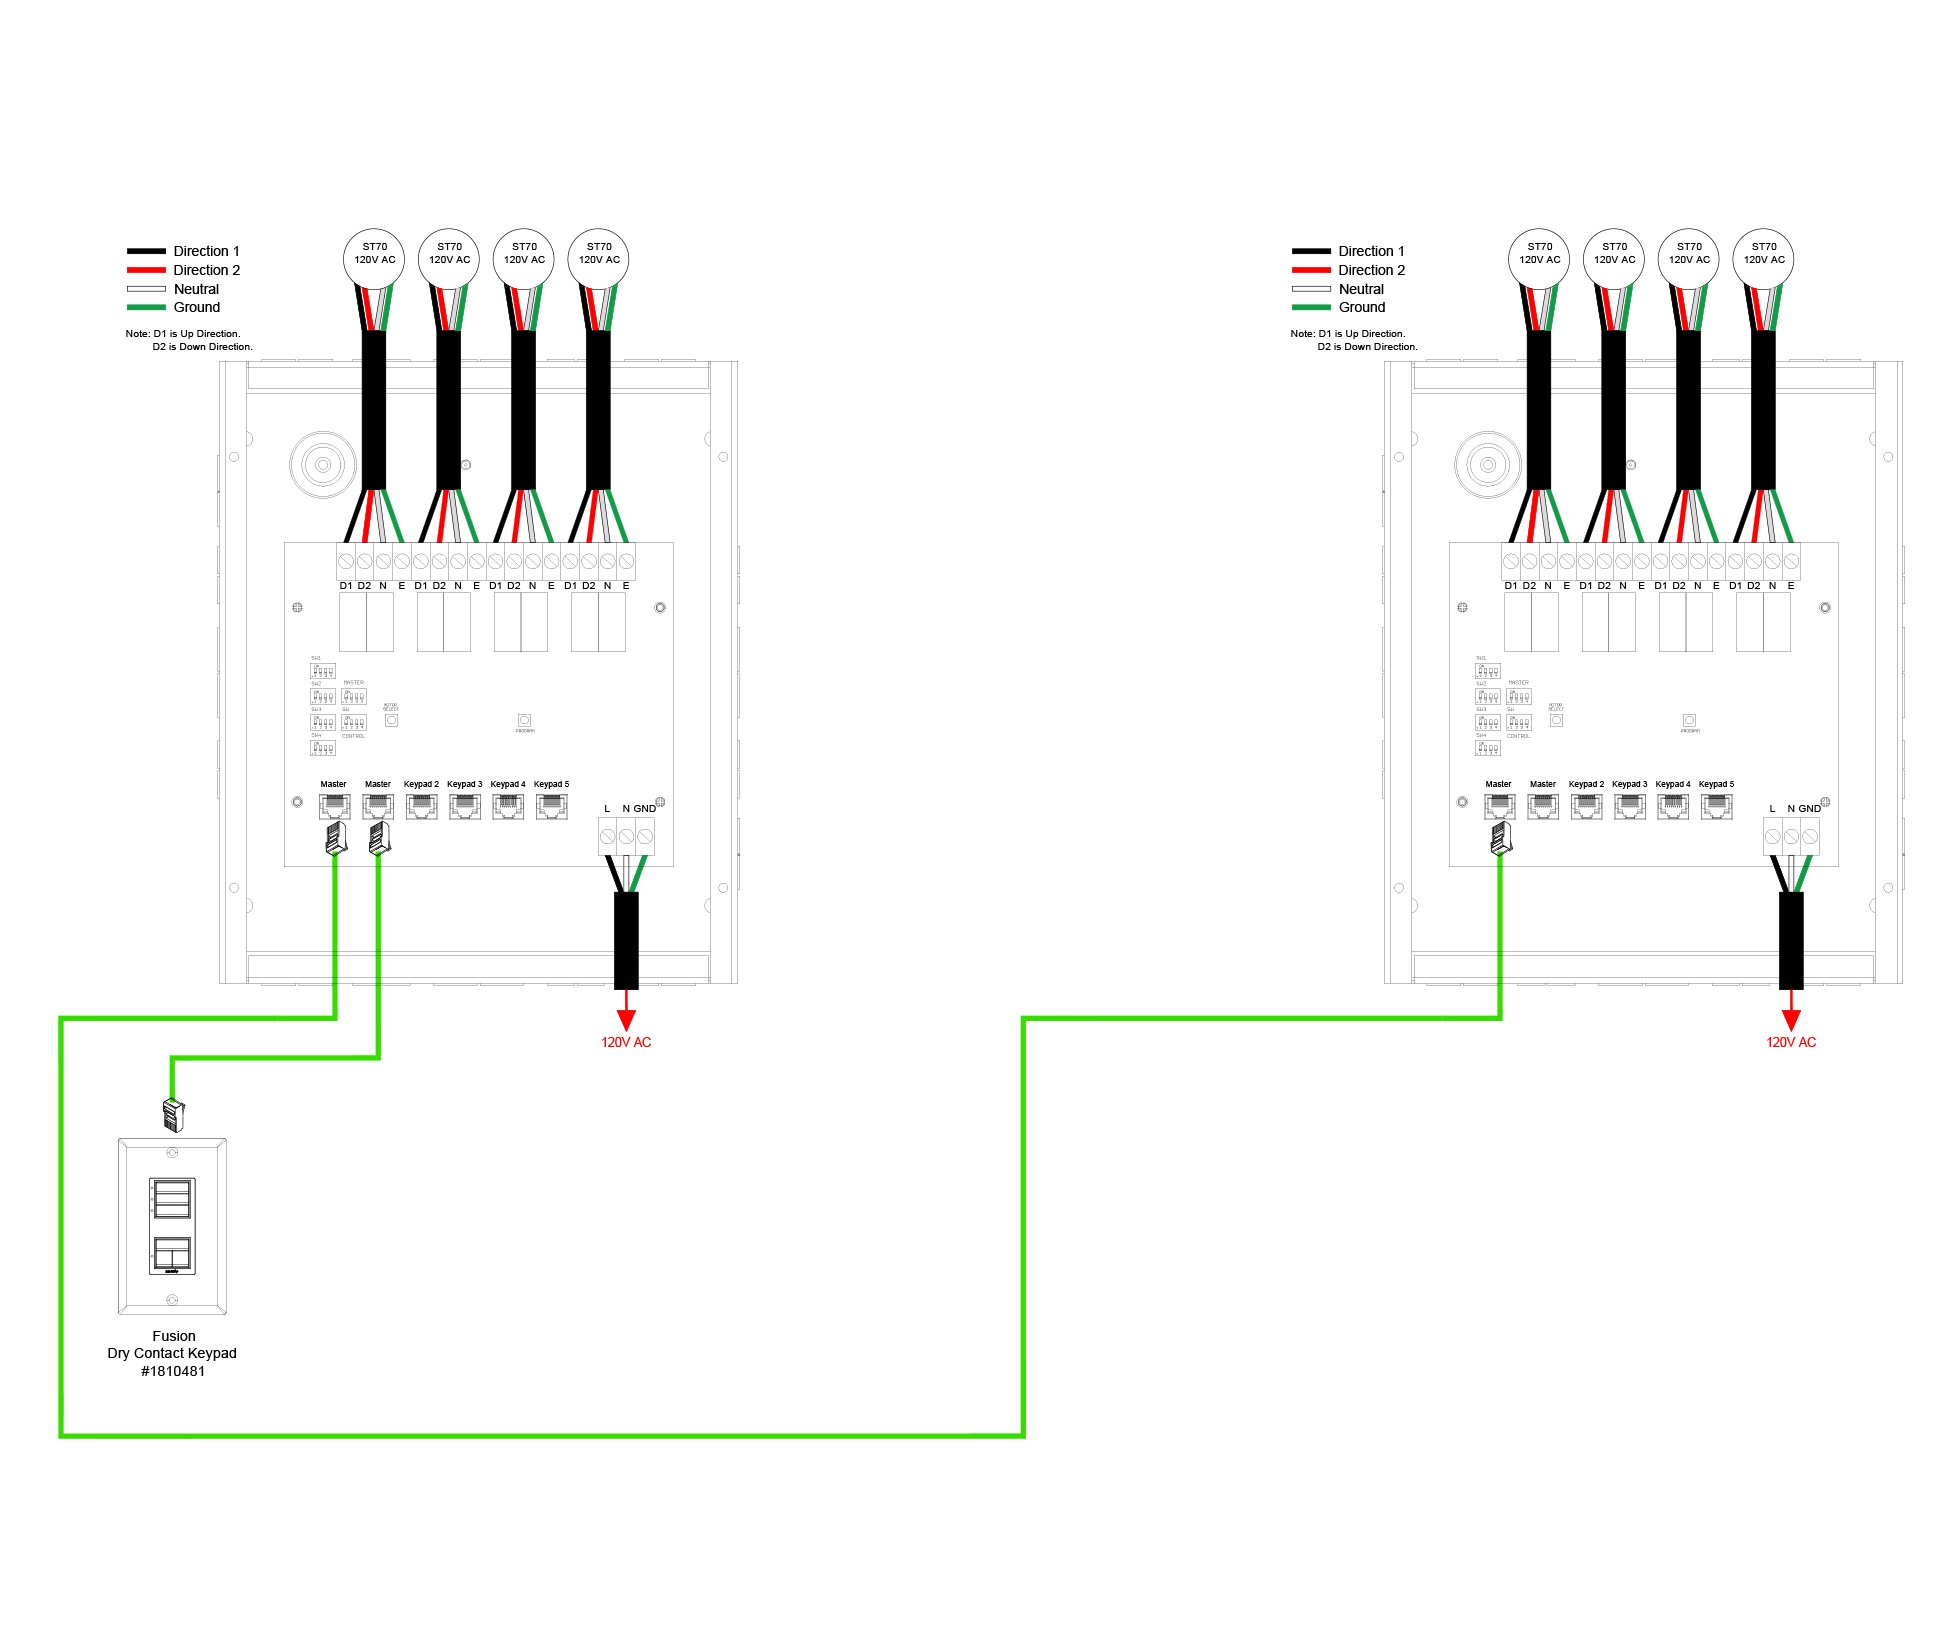 grafik eye wiring diagram pdf